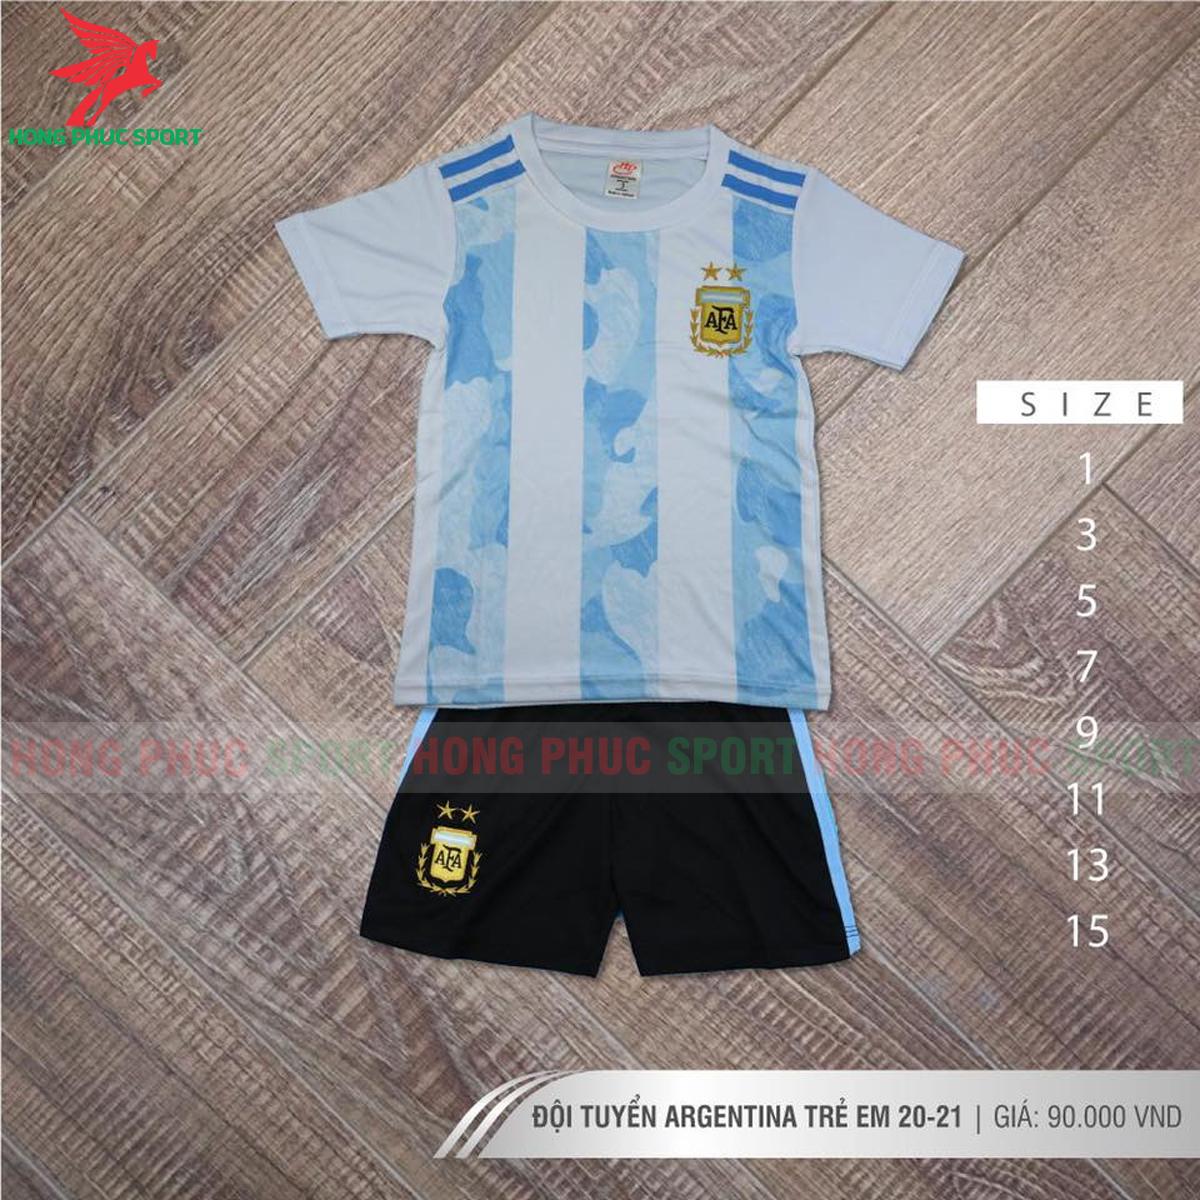 https://cdn.hongphucsport.com/unsafe/s4.shopbay.vn/files/285/ao-bong-da-tre-em-tuyen-argentina-2021-san-nha-608128ba49c0c.png